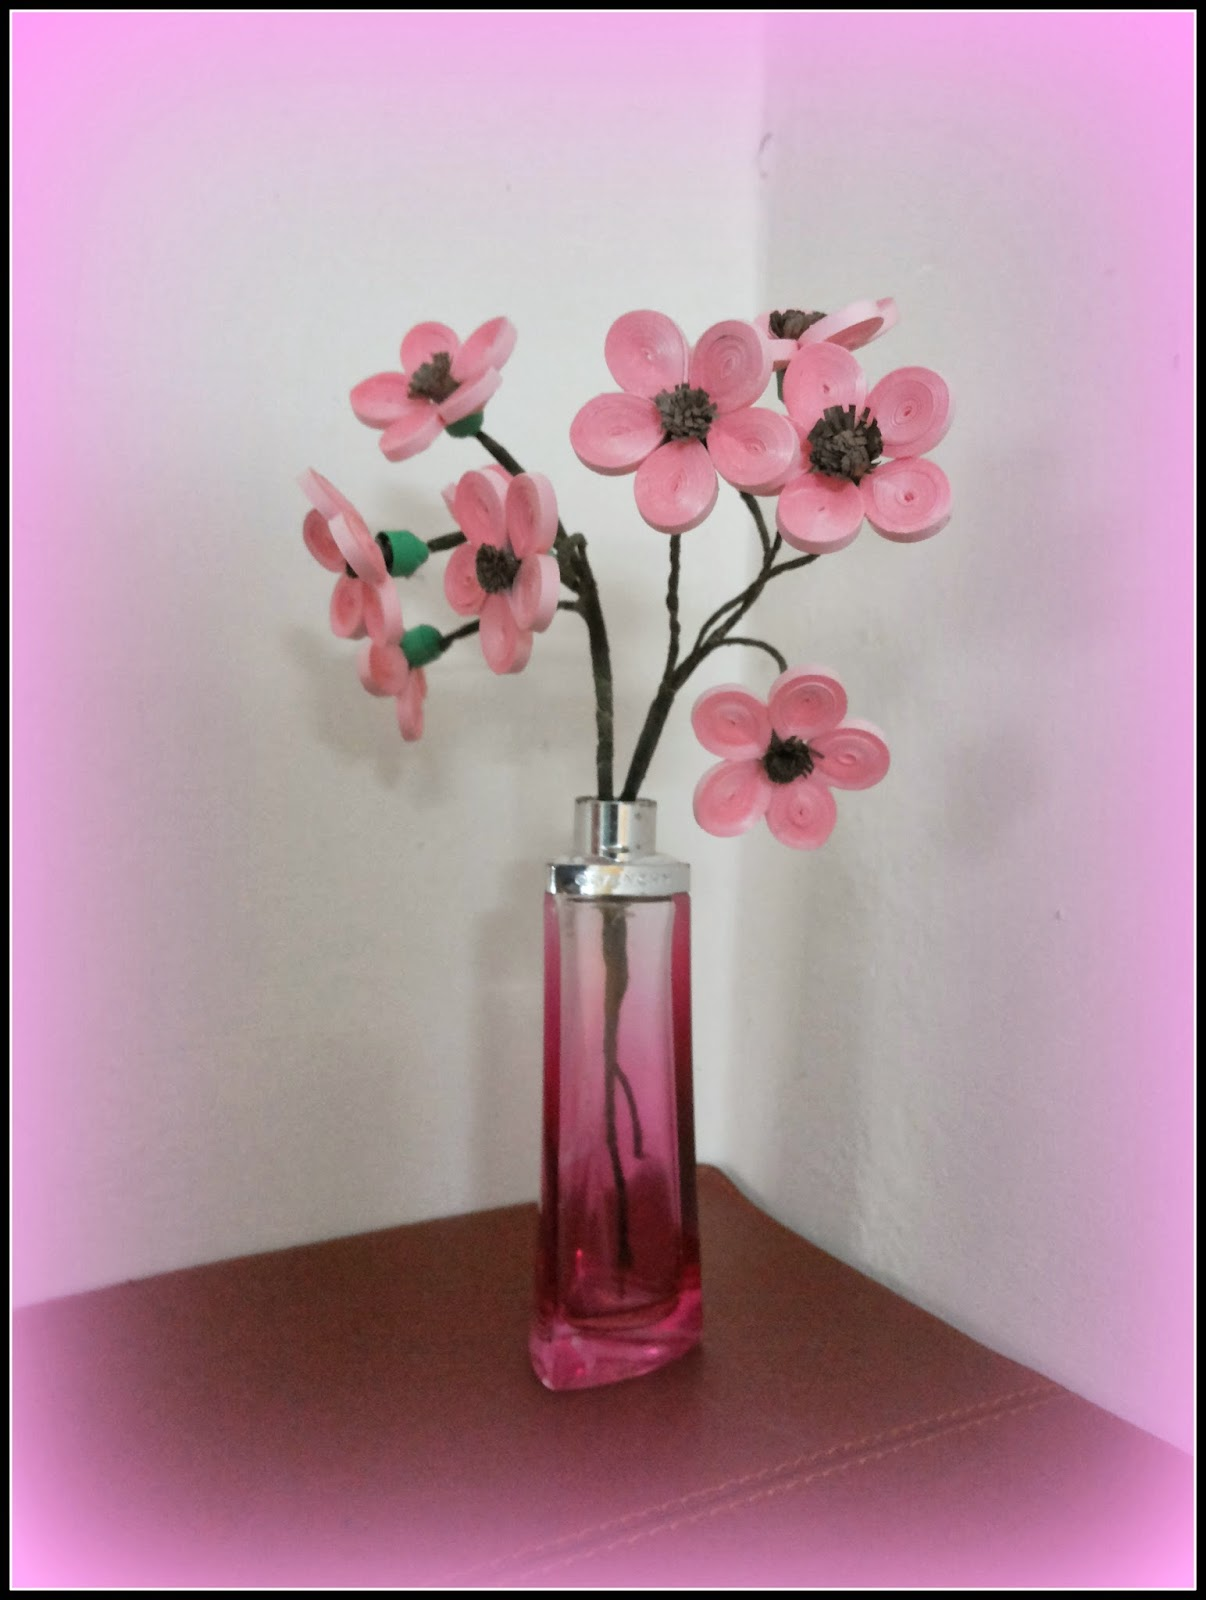 http://quillingzone.blogspot.tw/2014/03/pink-flower-arrangement.html